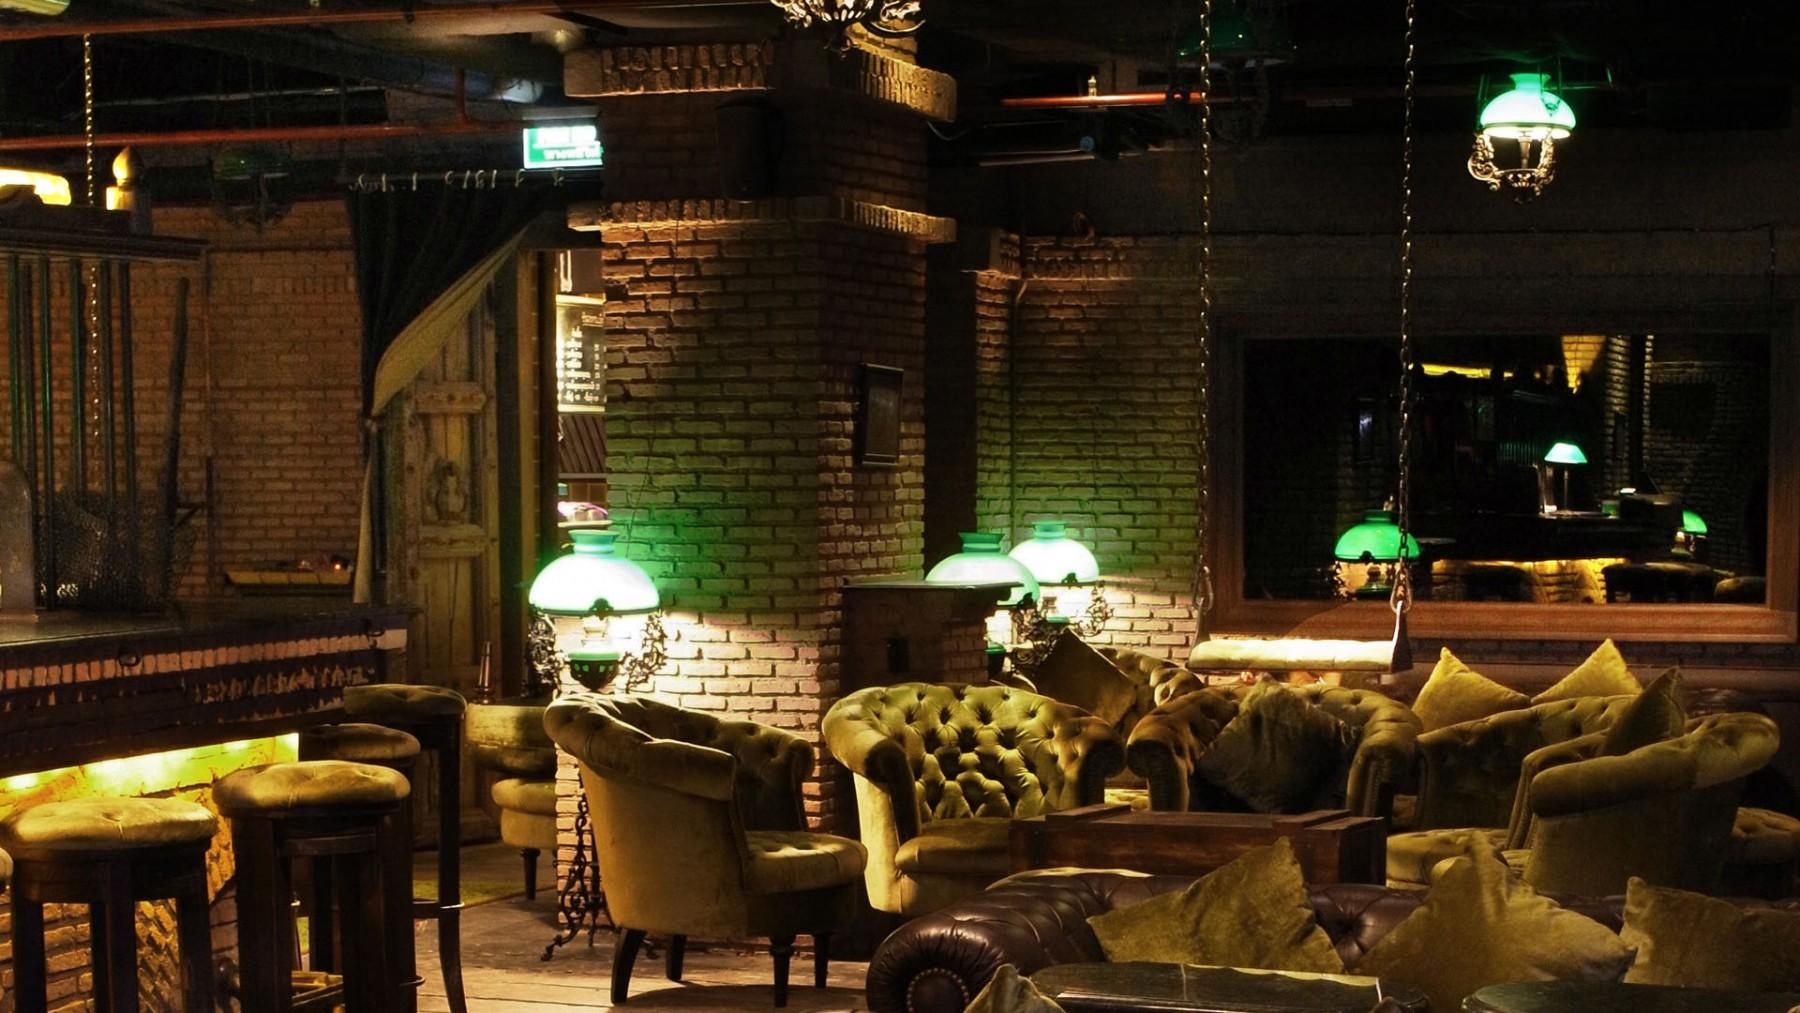 Bangkok Nightlife has found a new home: Maggie Choos — Stephanie Rowe